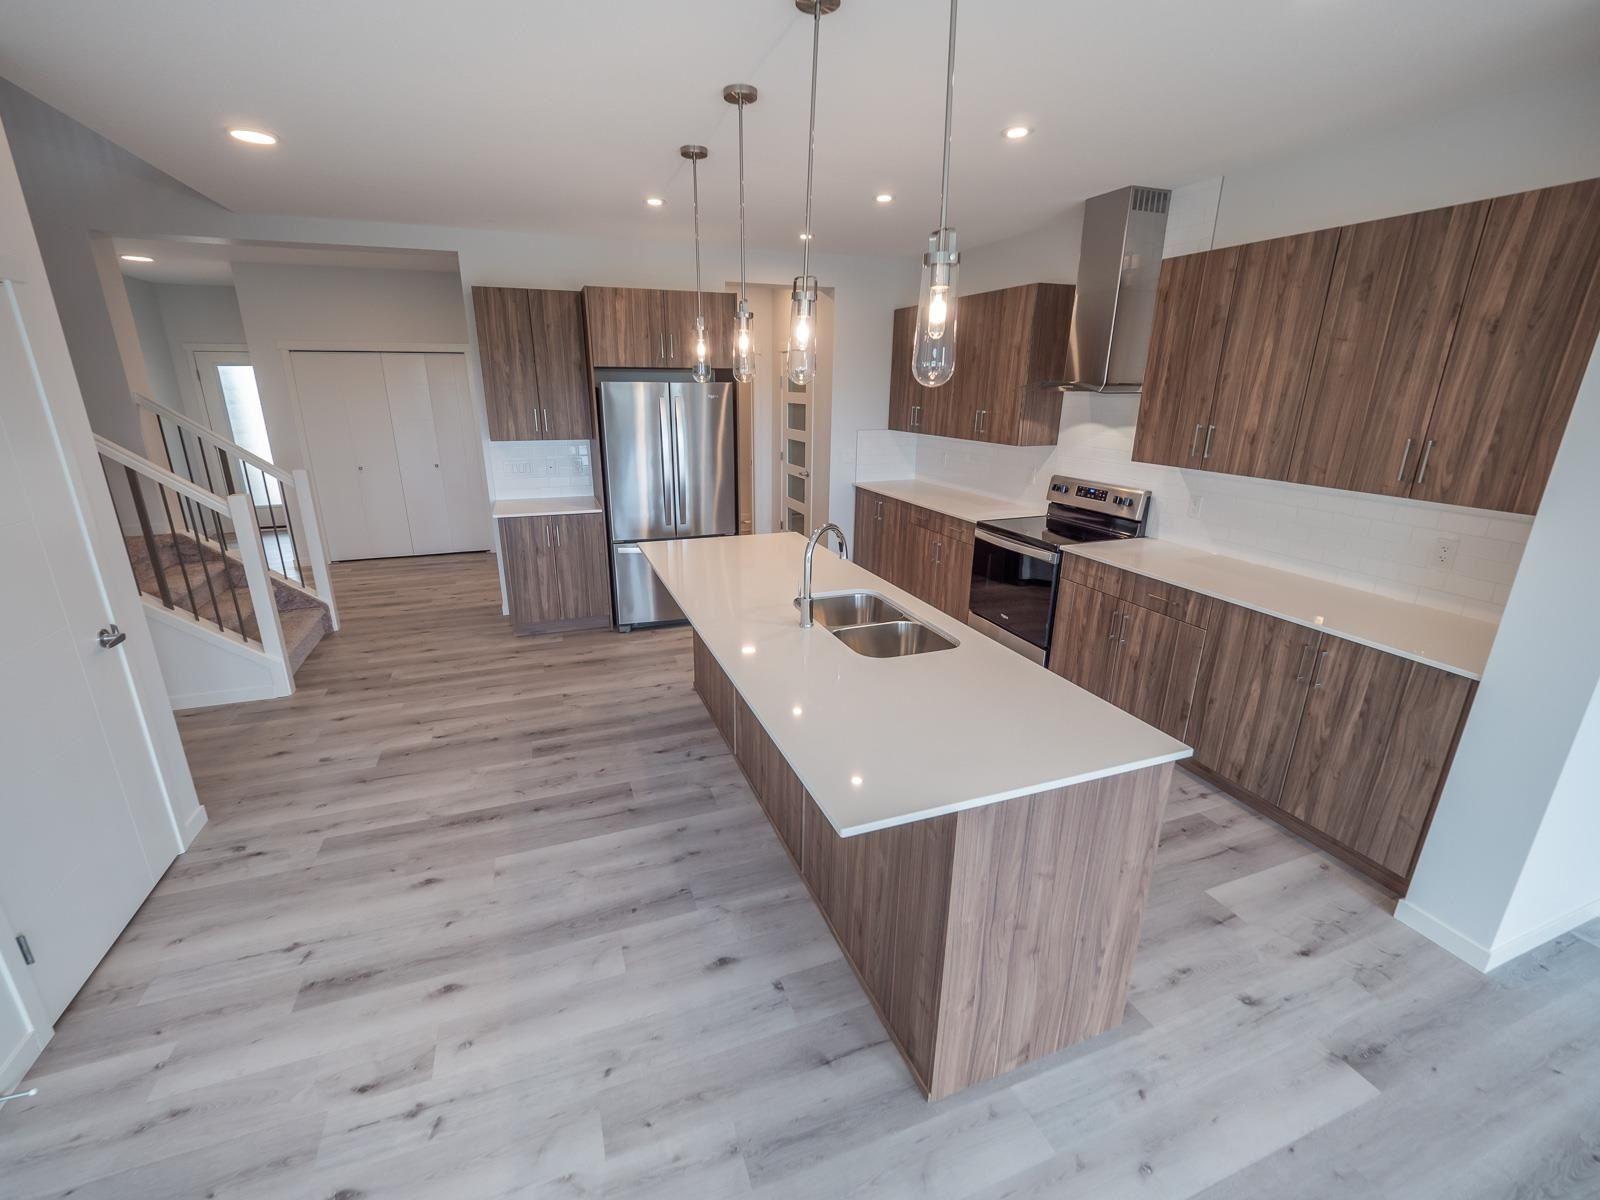 Main Photo: 20031 26 Avenue in Edmonton: Zone 57 House for sale : MLS®# E4247510